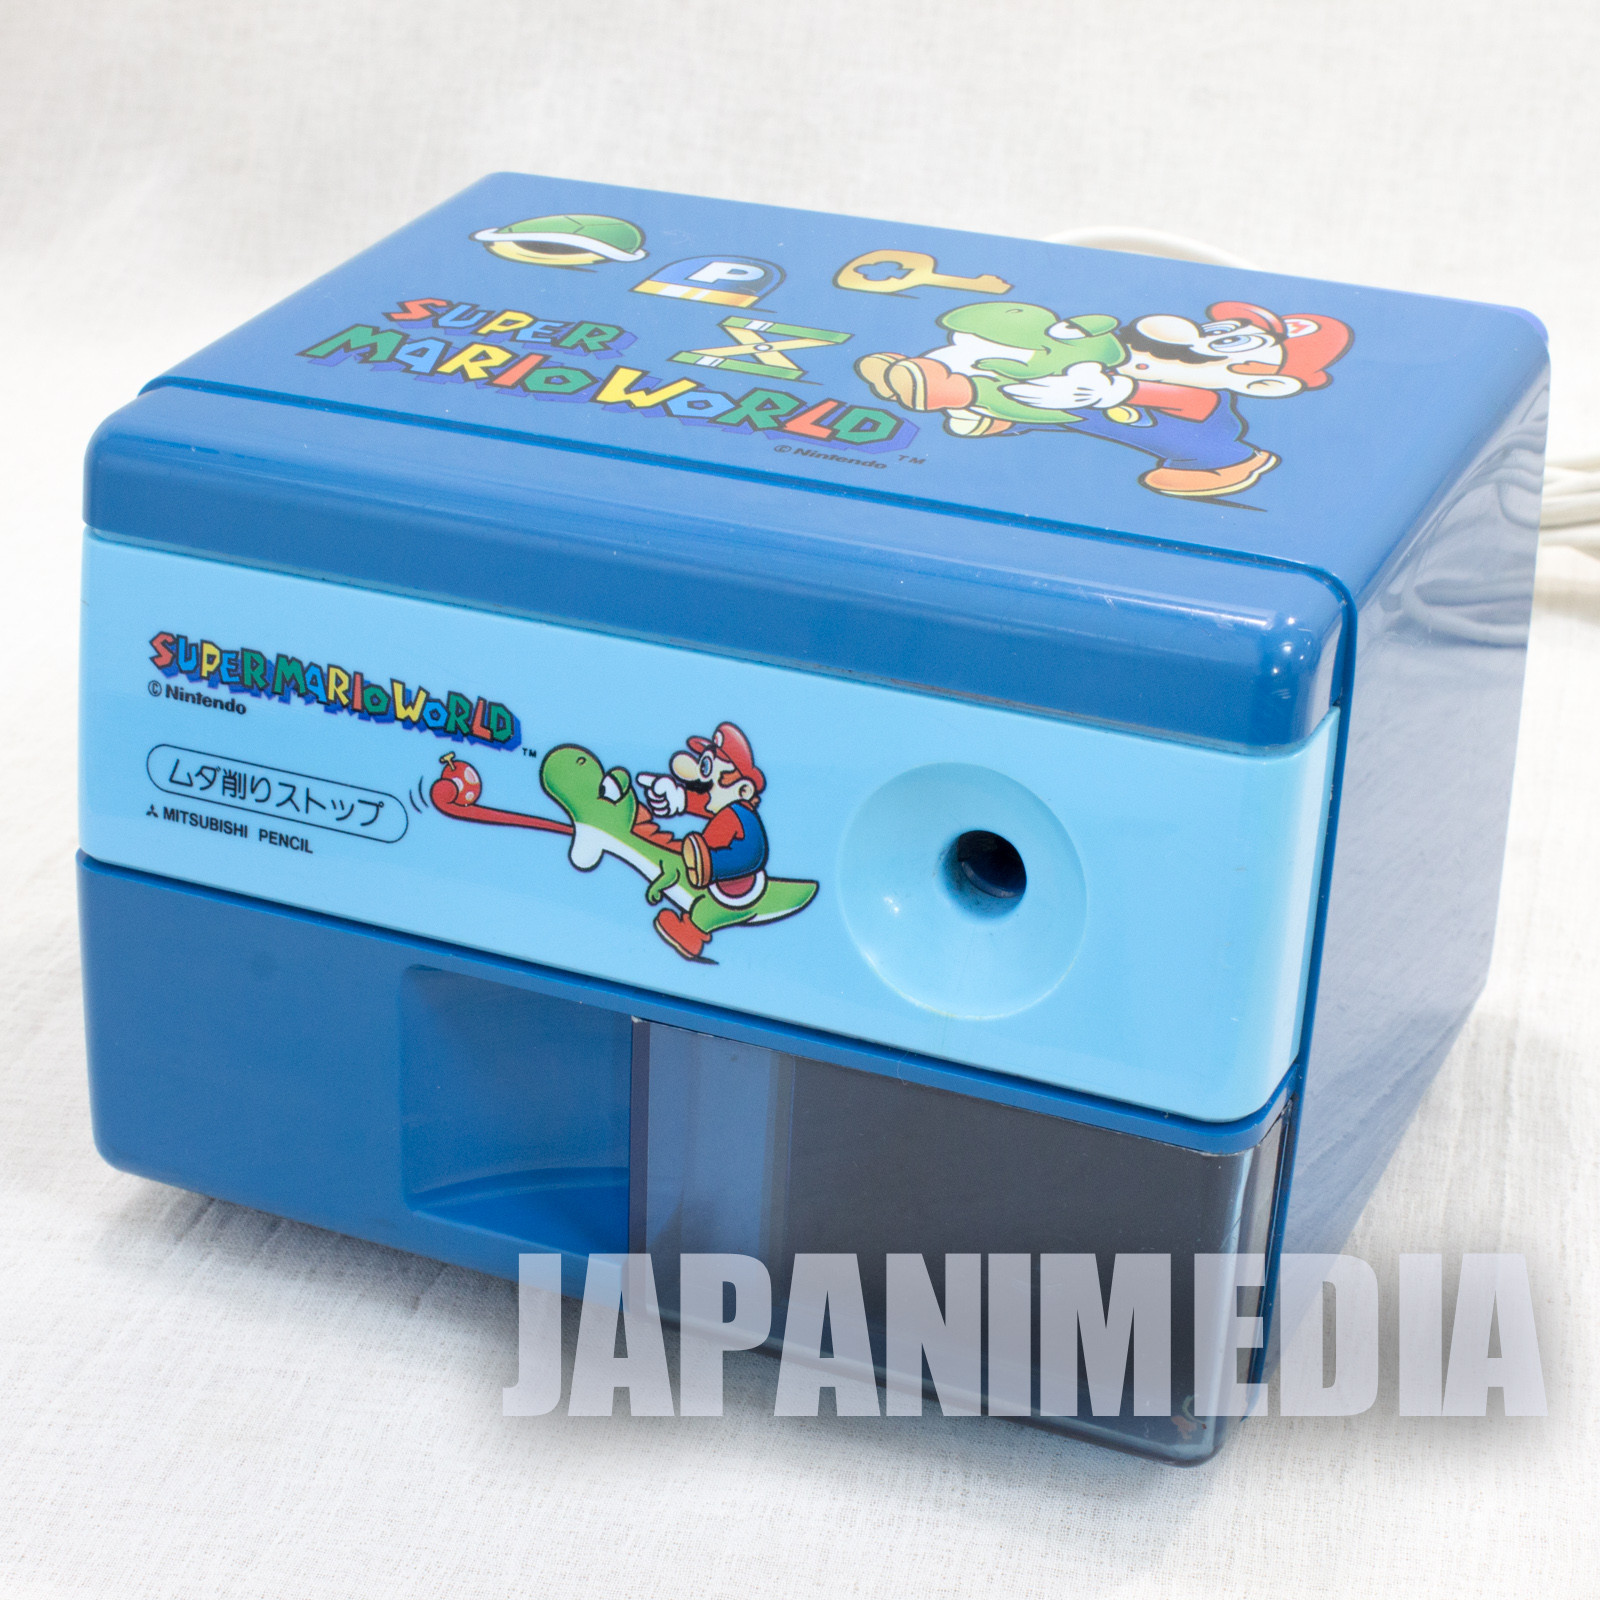 RARE! Super Mario World Bros. Electric Pencil Sharpener JAPAN GAME Nintendo